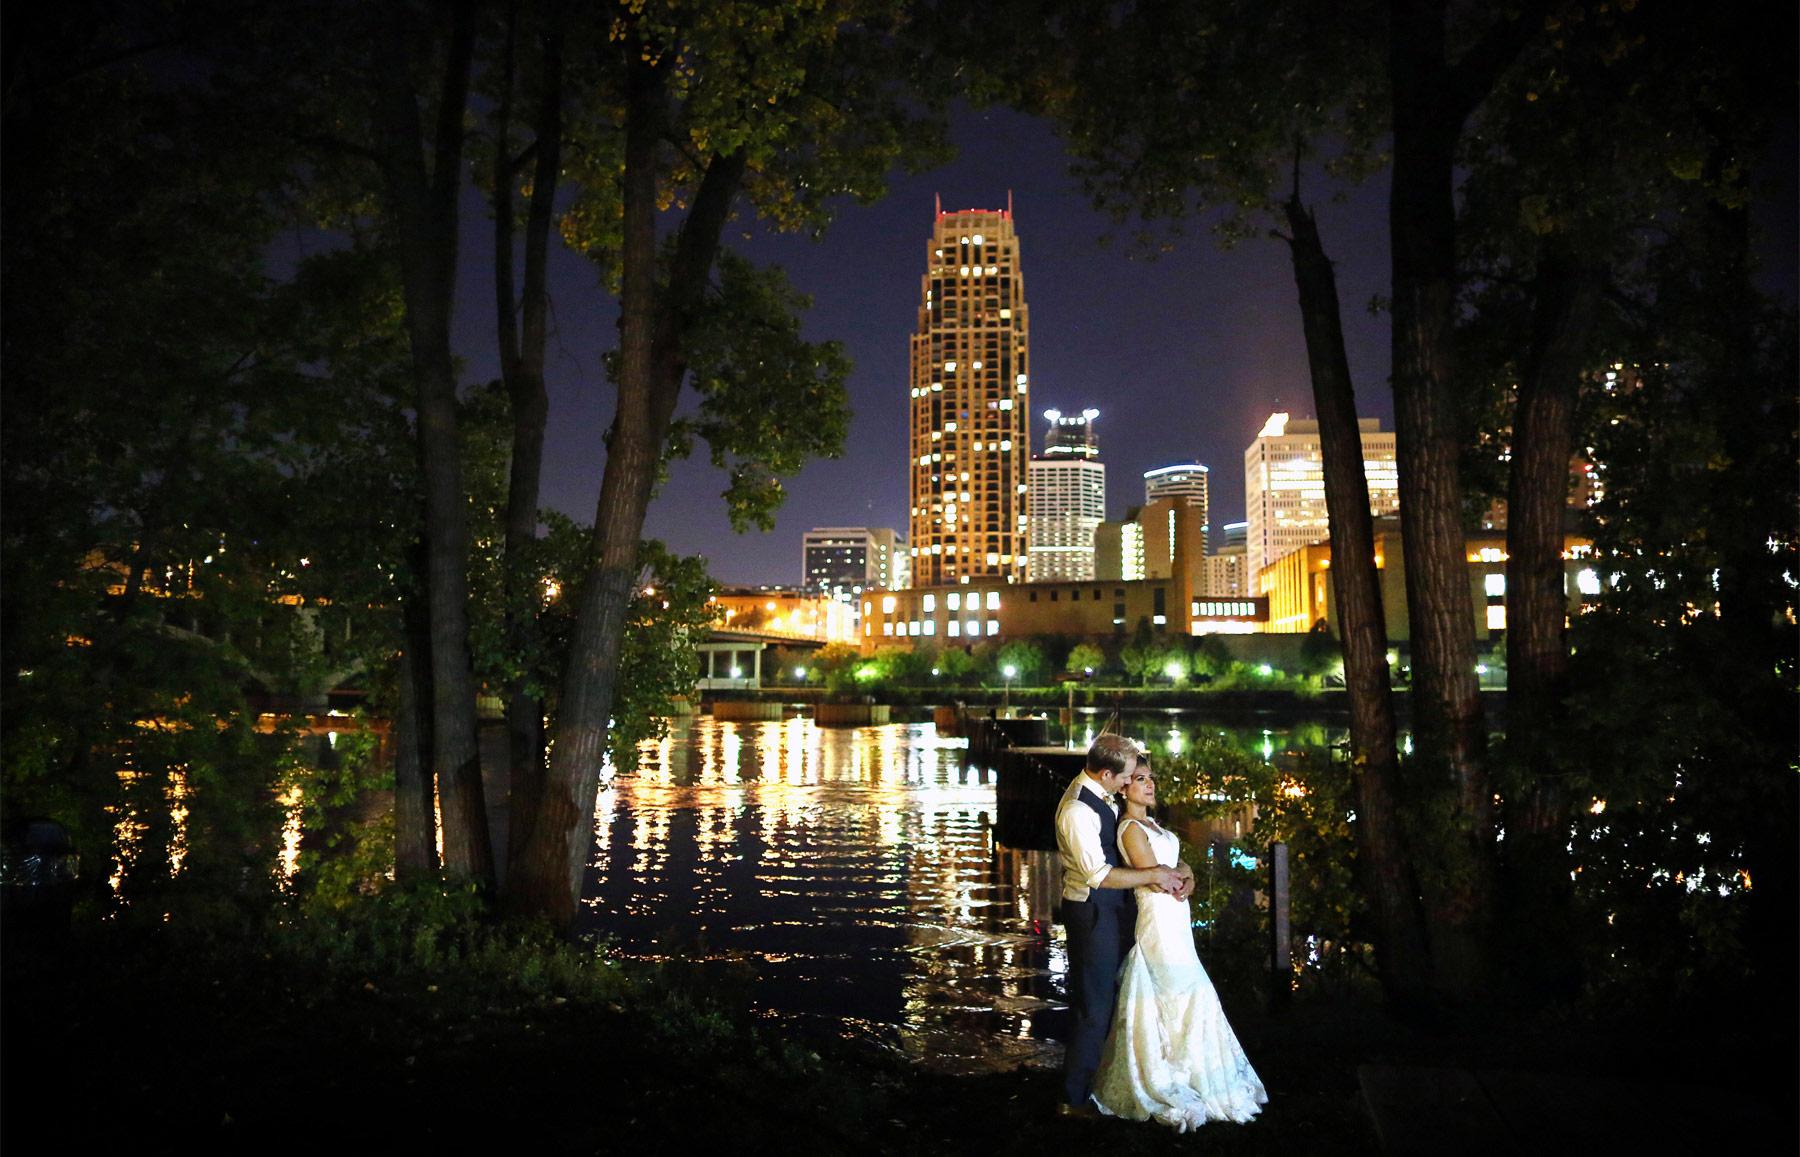 26-Minneapolis-Minnesota-Wedding-Photographer-by-Andrew-Vick-Photography-Fall-Autumn-Mississippi-River-Bride-Groom-Embrace-Paula-and-Jason.jpg